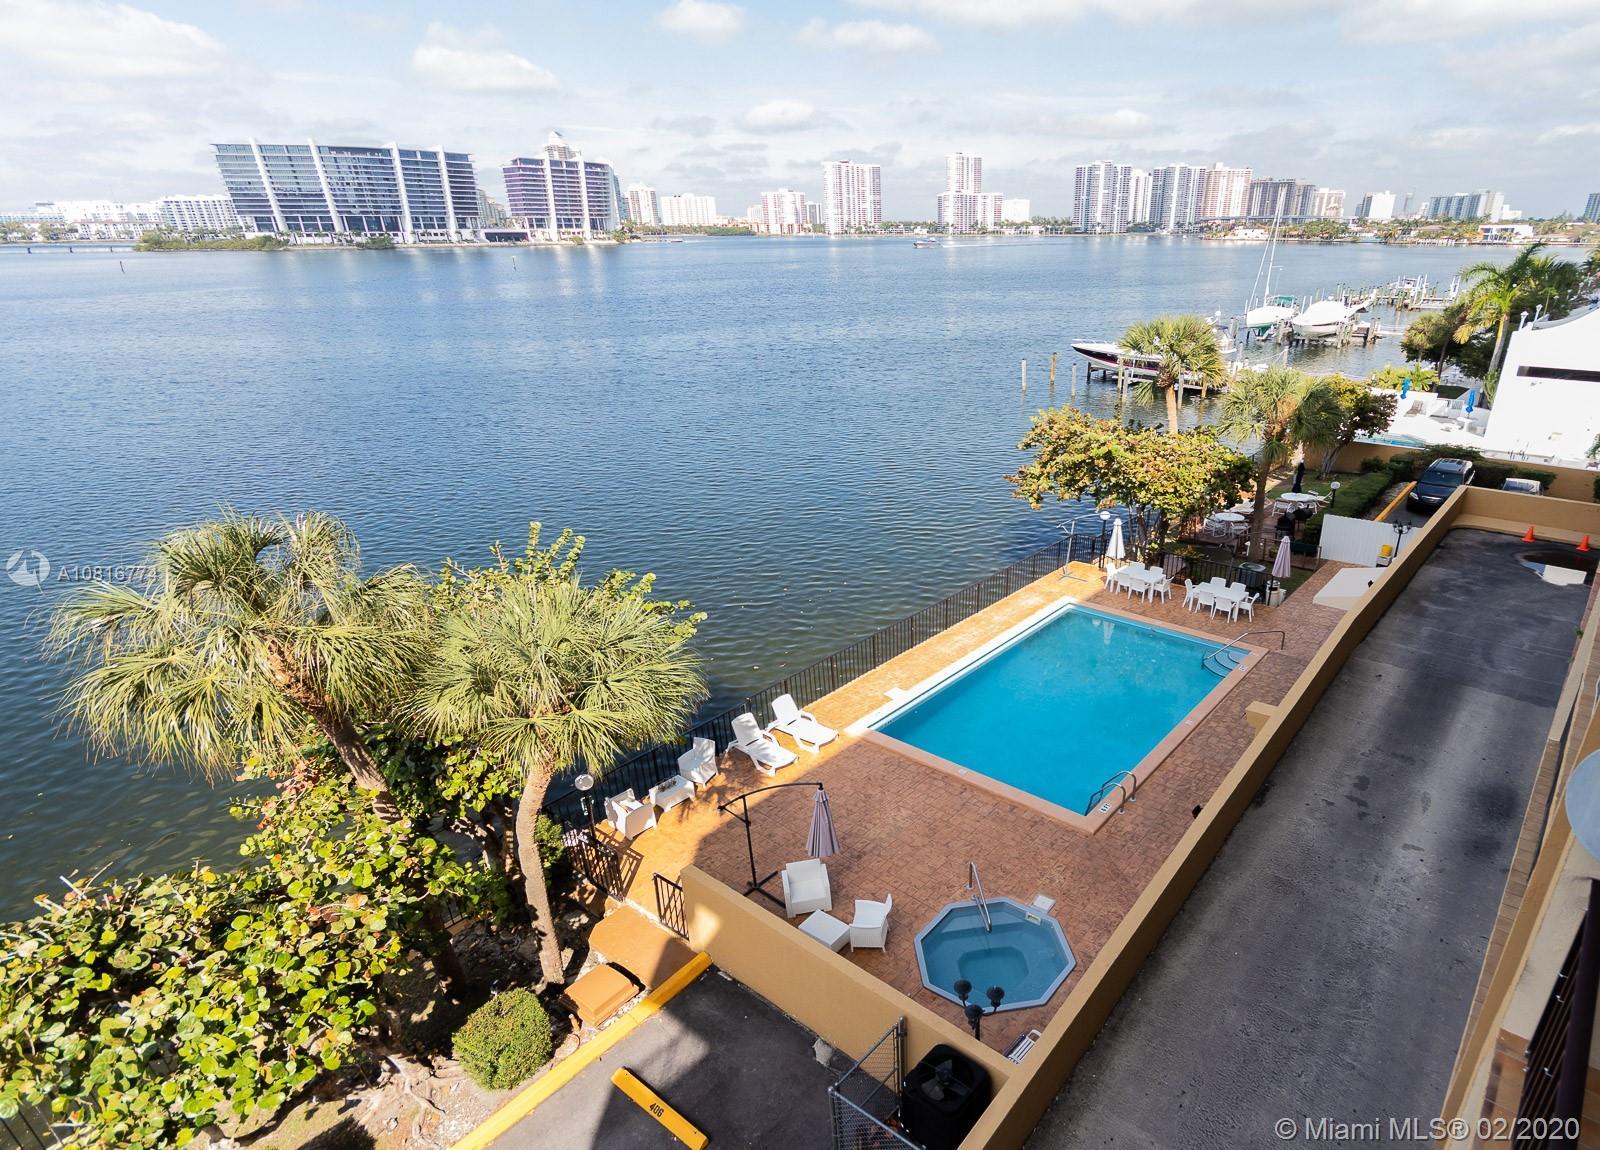 17878 N Bay Rd #402 For Sale A10816774, FL